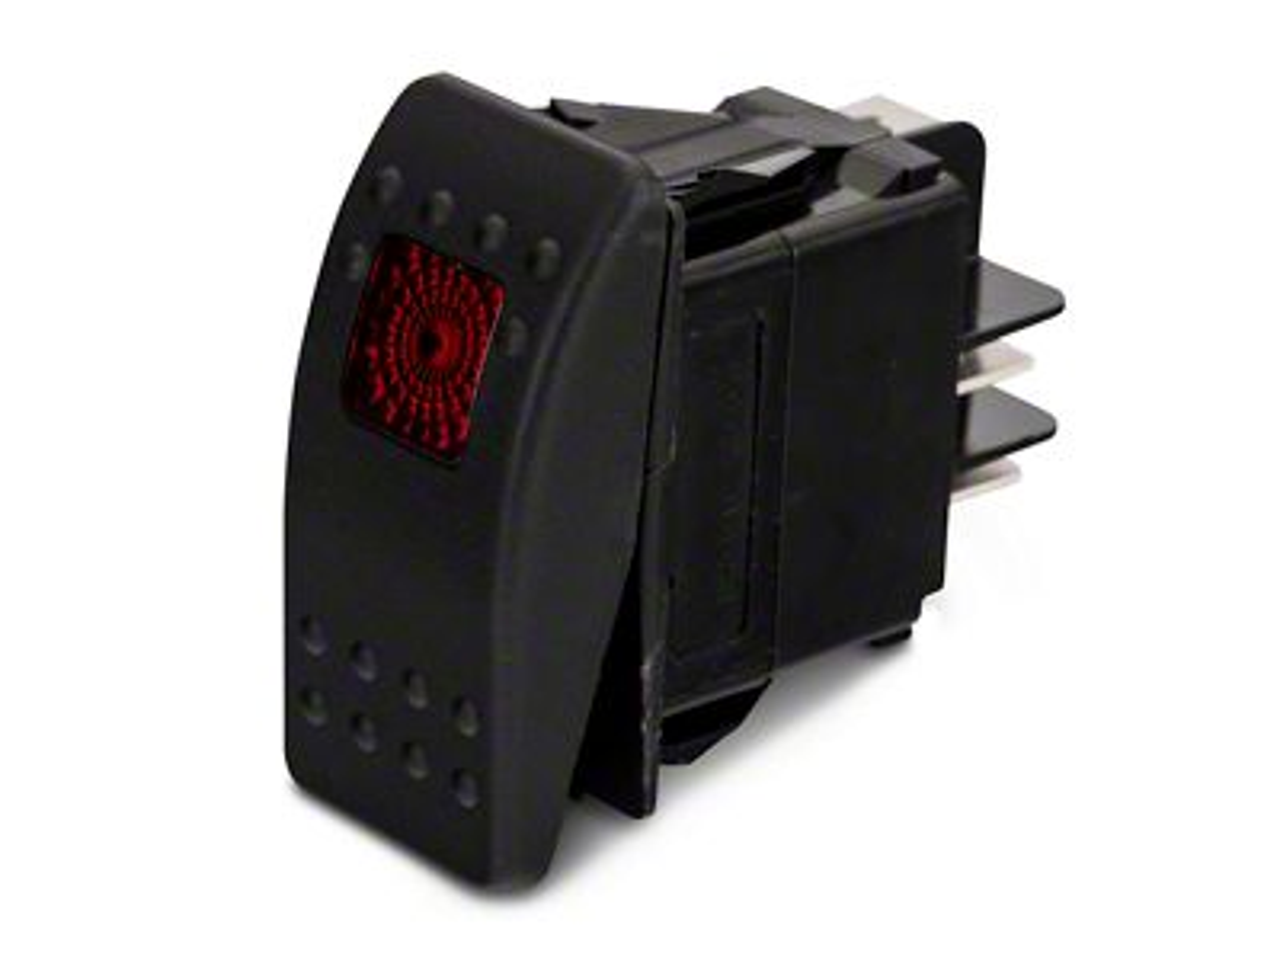 Daystar Rocker Switch - Red Light (87-18 Jeep Wrangler YJ, TJ, JK & JL)